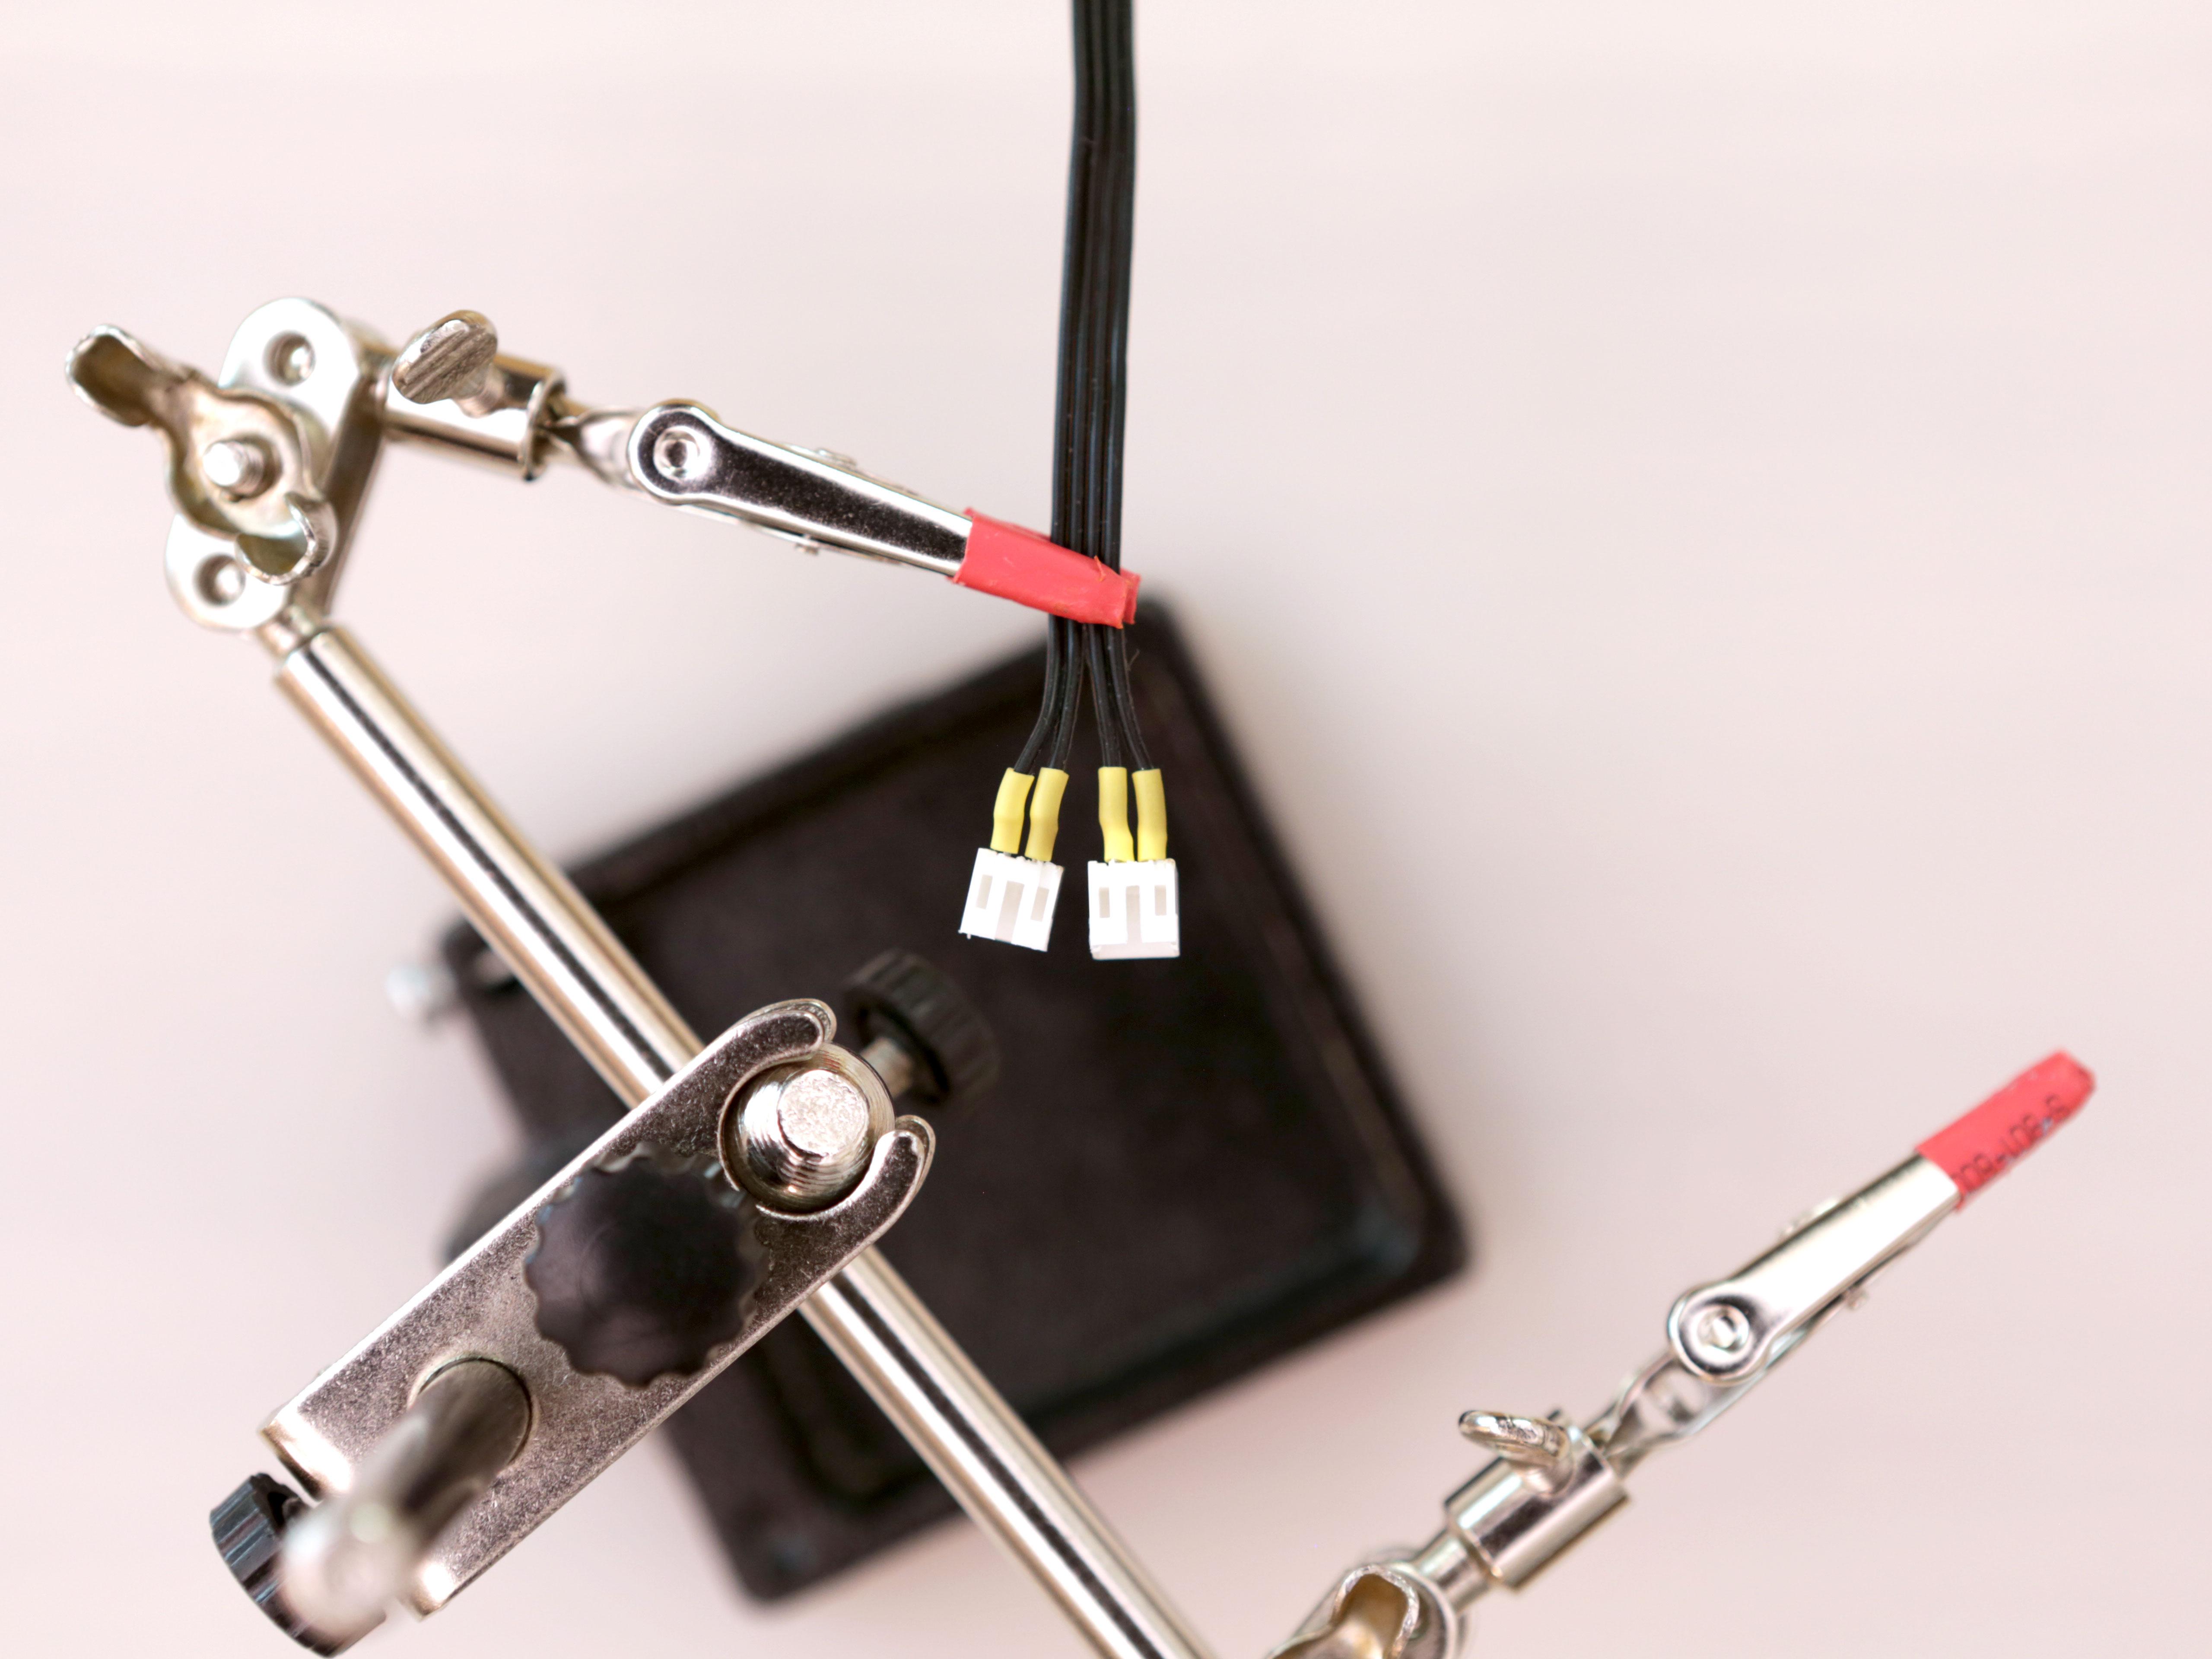 3d_printing_tswitch-2jst-wiring.jpg